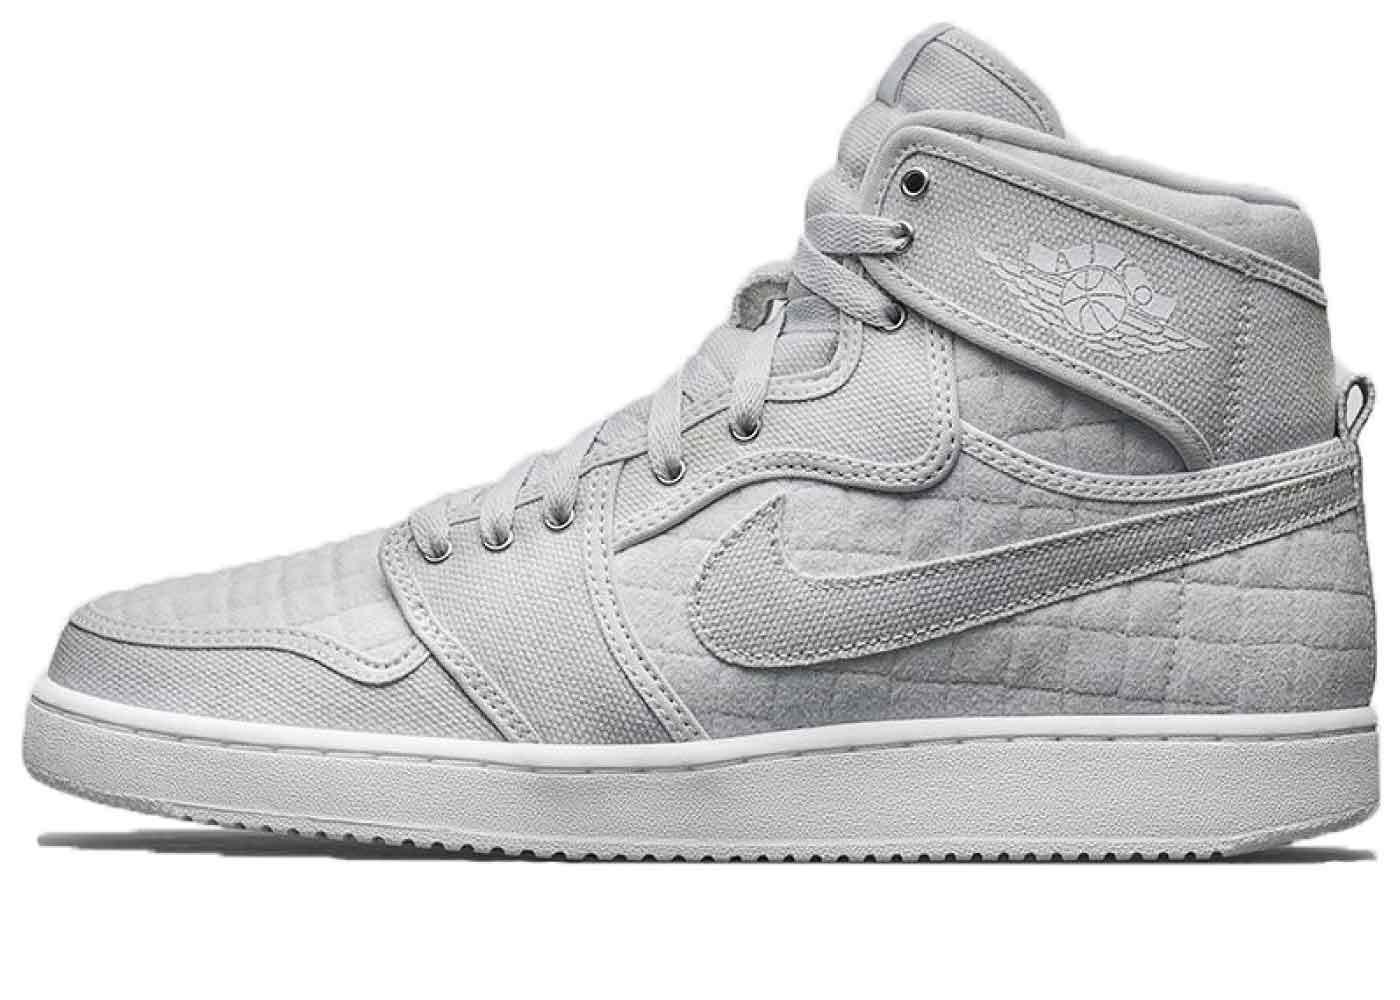 Nike Air Jordan 1 Retro AJKO Pure Platinumの写真